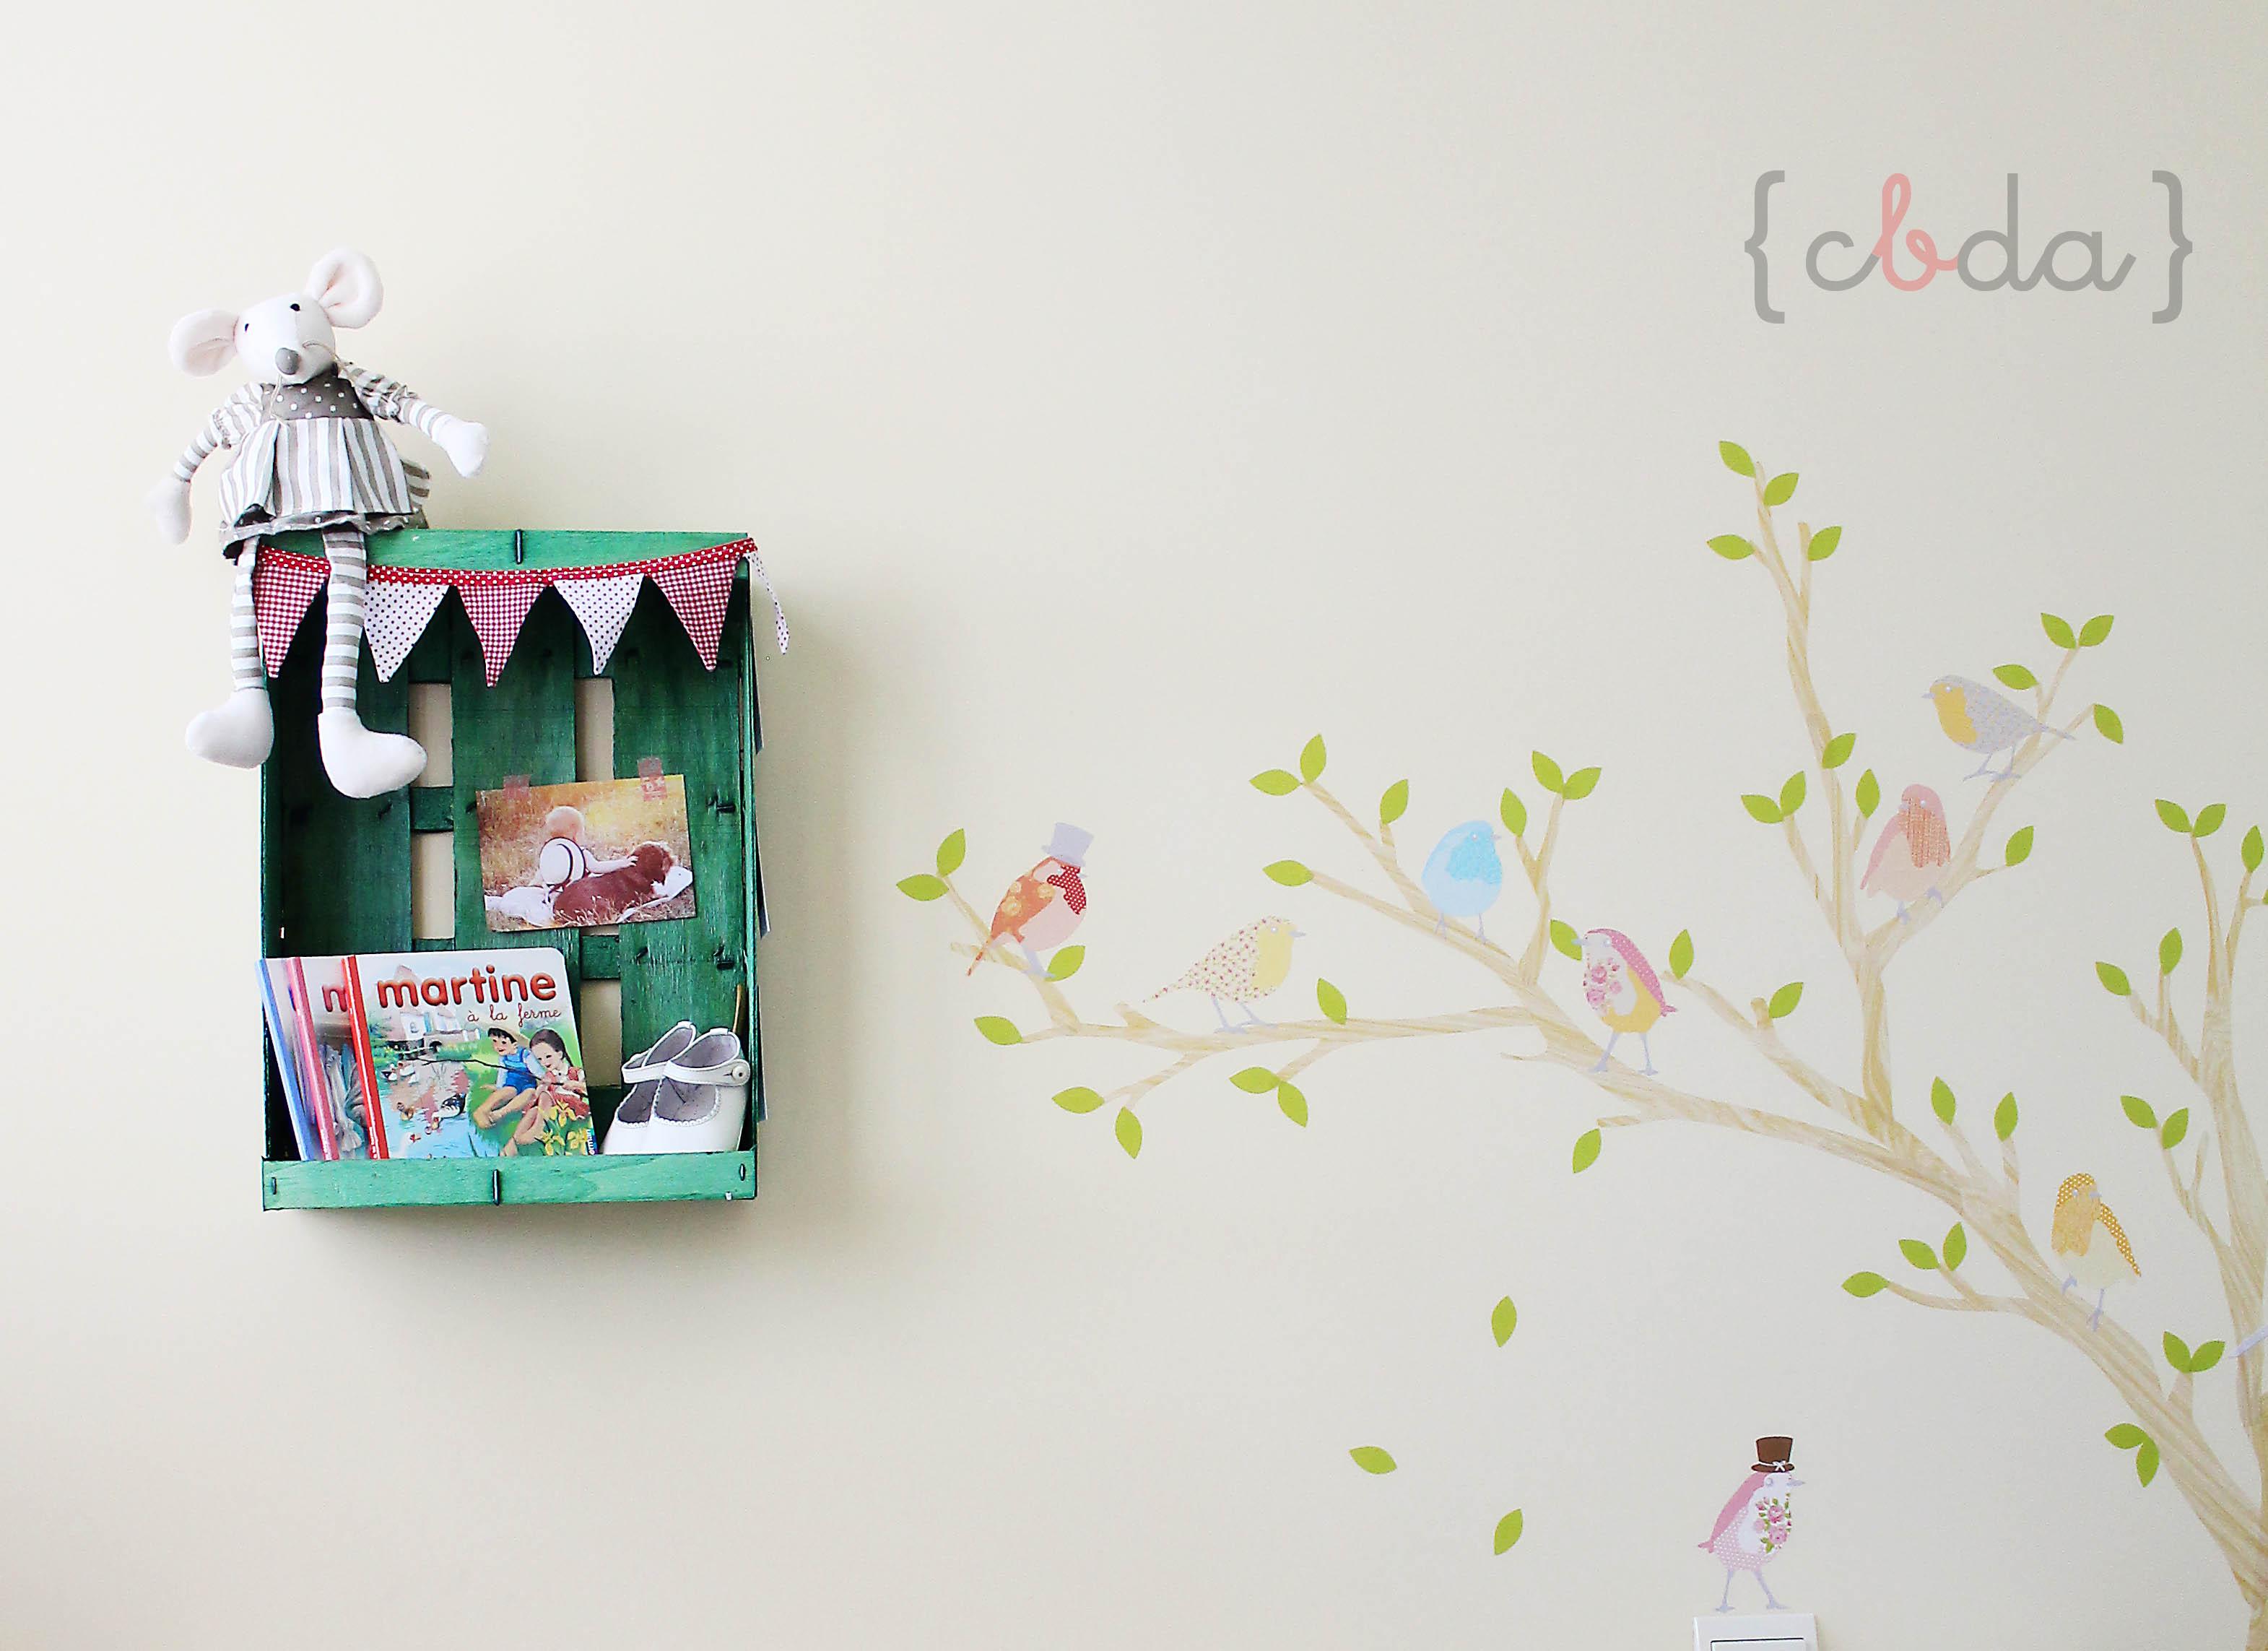 De caja de frutas a estanter a diy con botas de agua - Estanterias con cajas de fruta ...